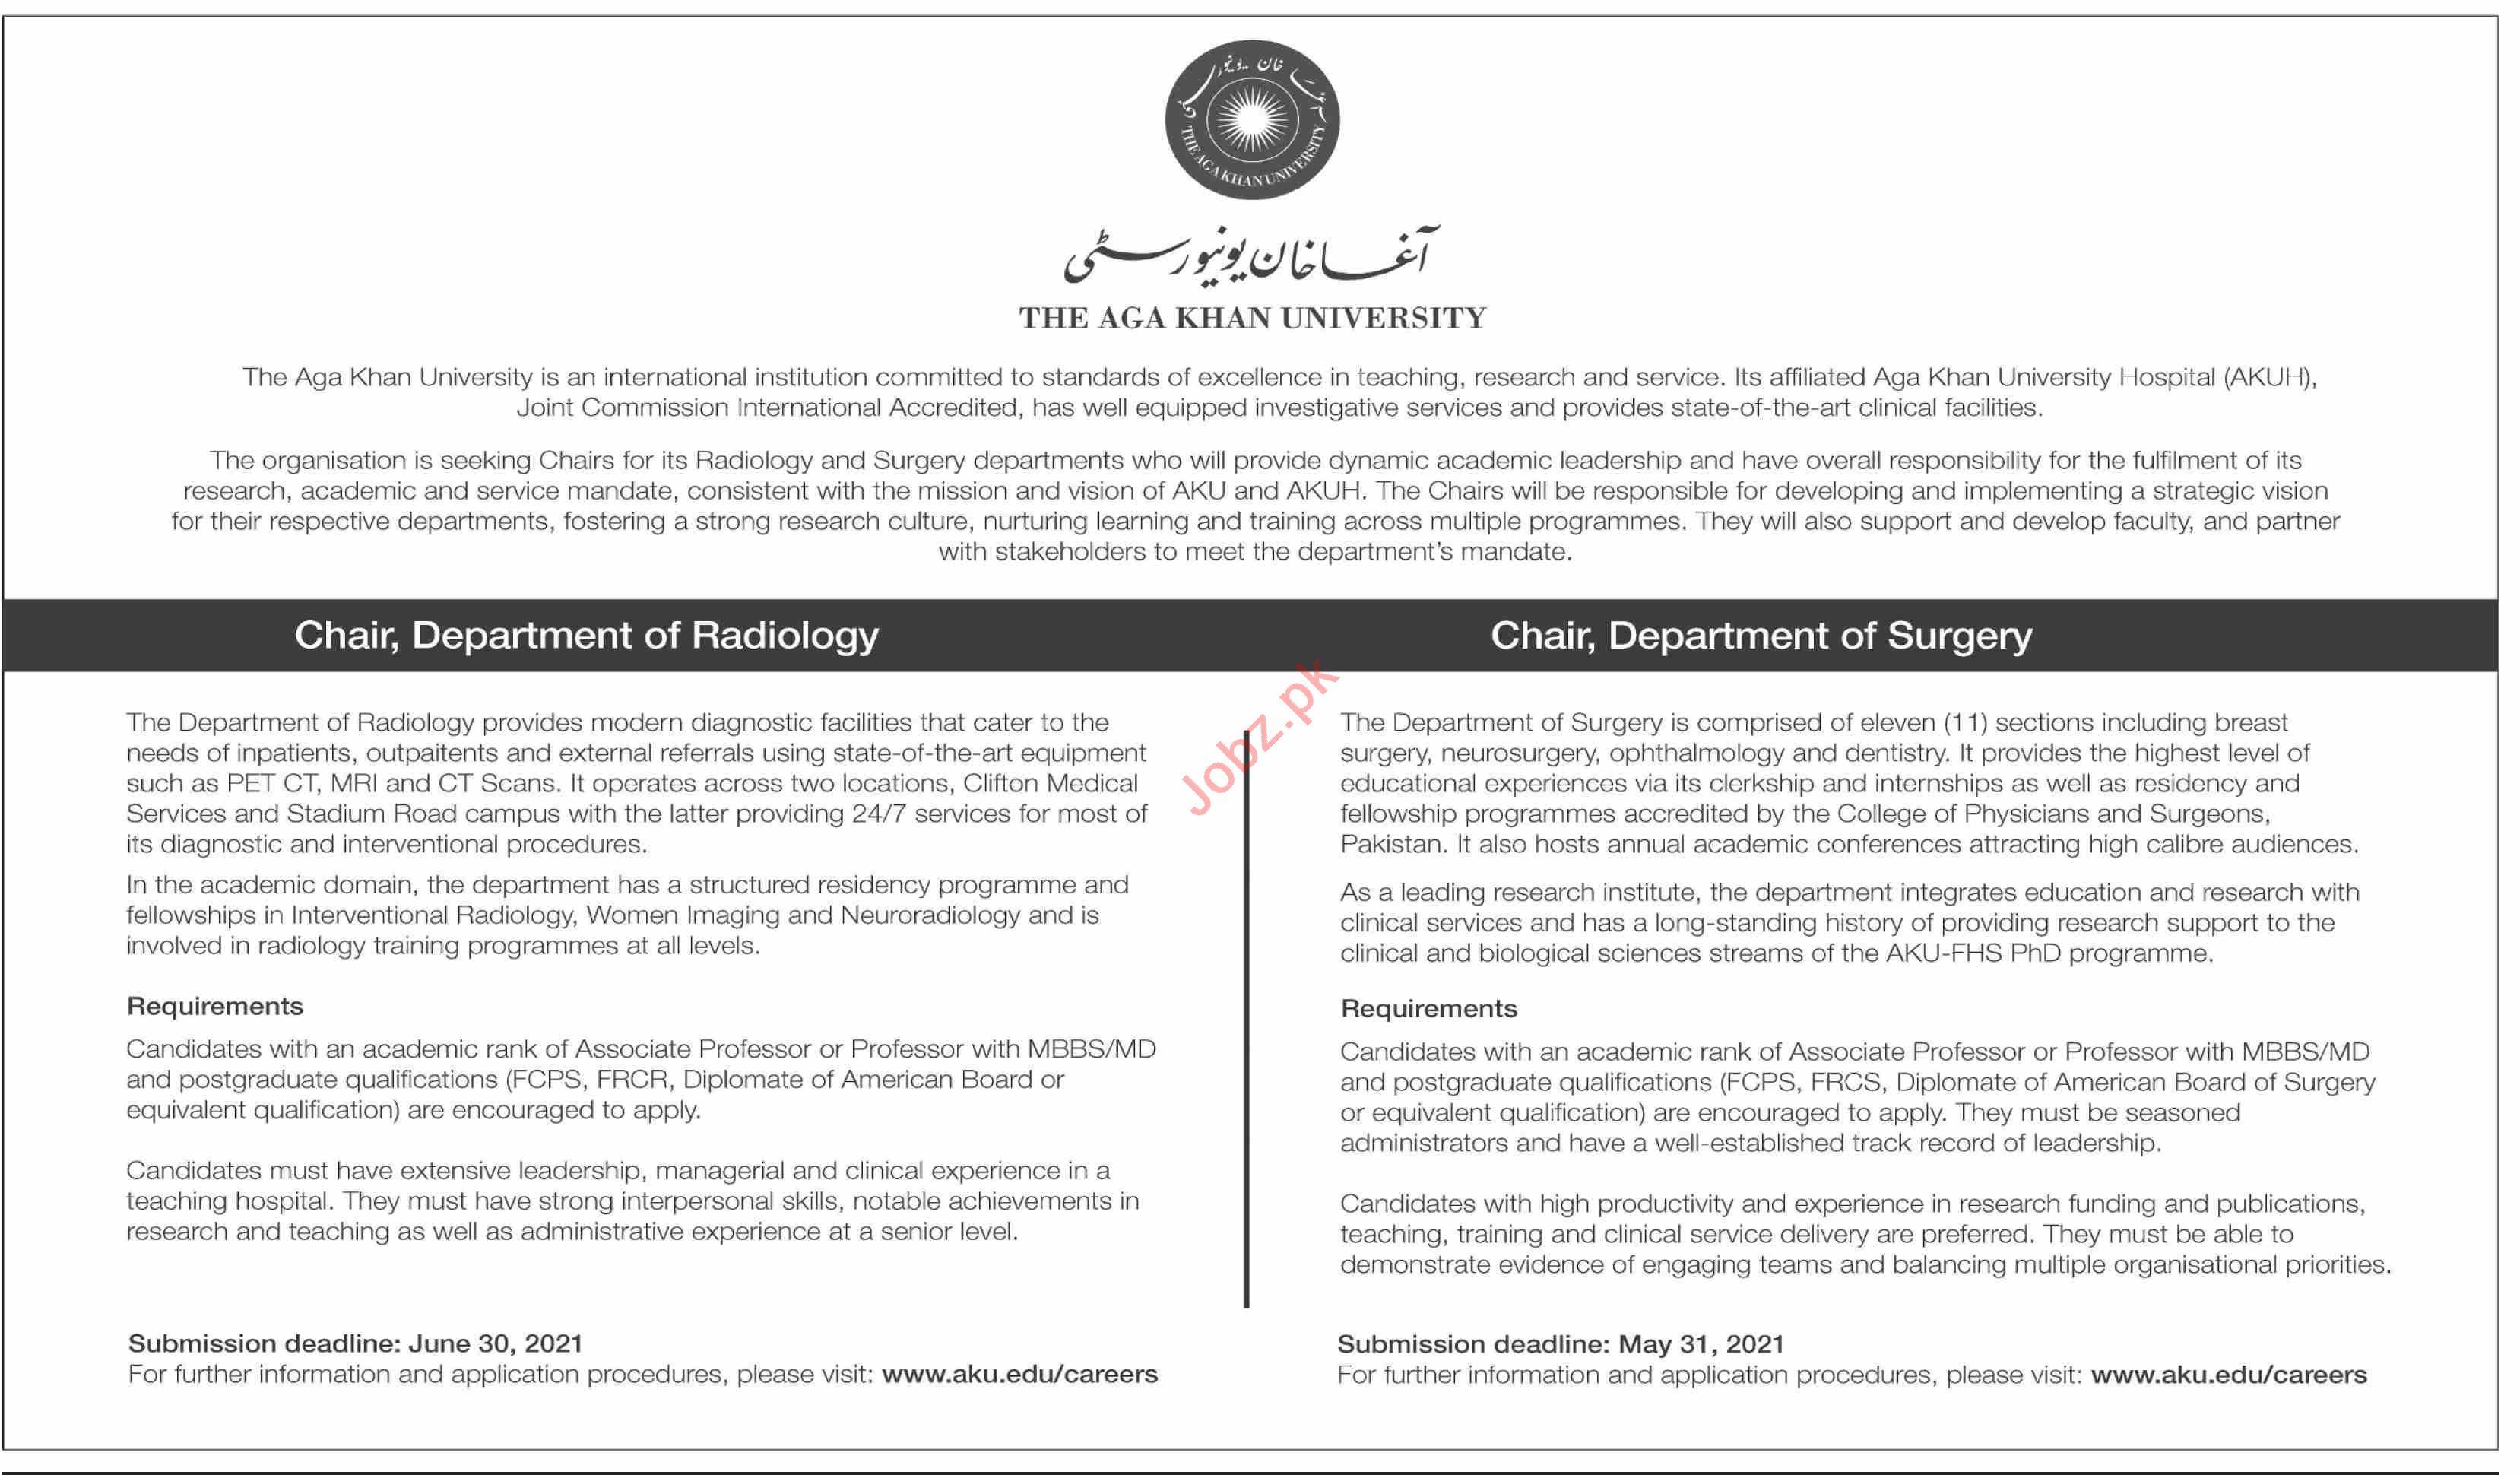 The Aga Khan University AKU Karachi Jobs 2021 for Chair